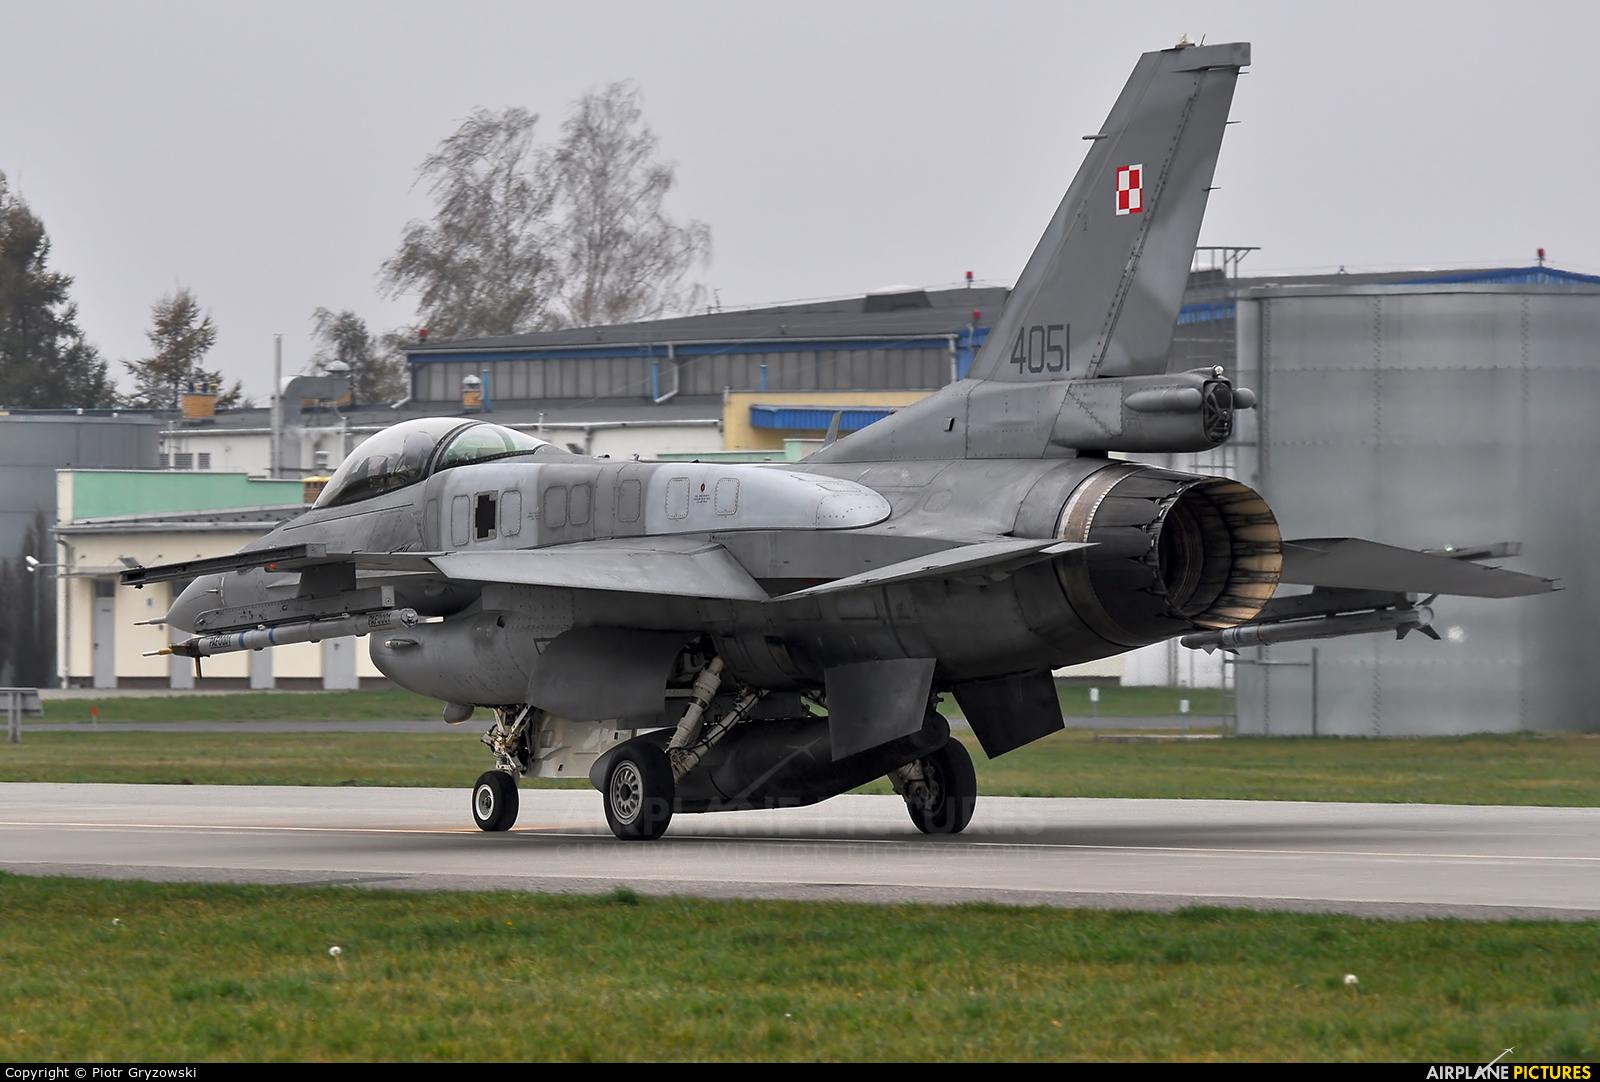 Poland - Air Force 4051 aircraft at Łask AB